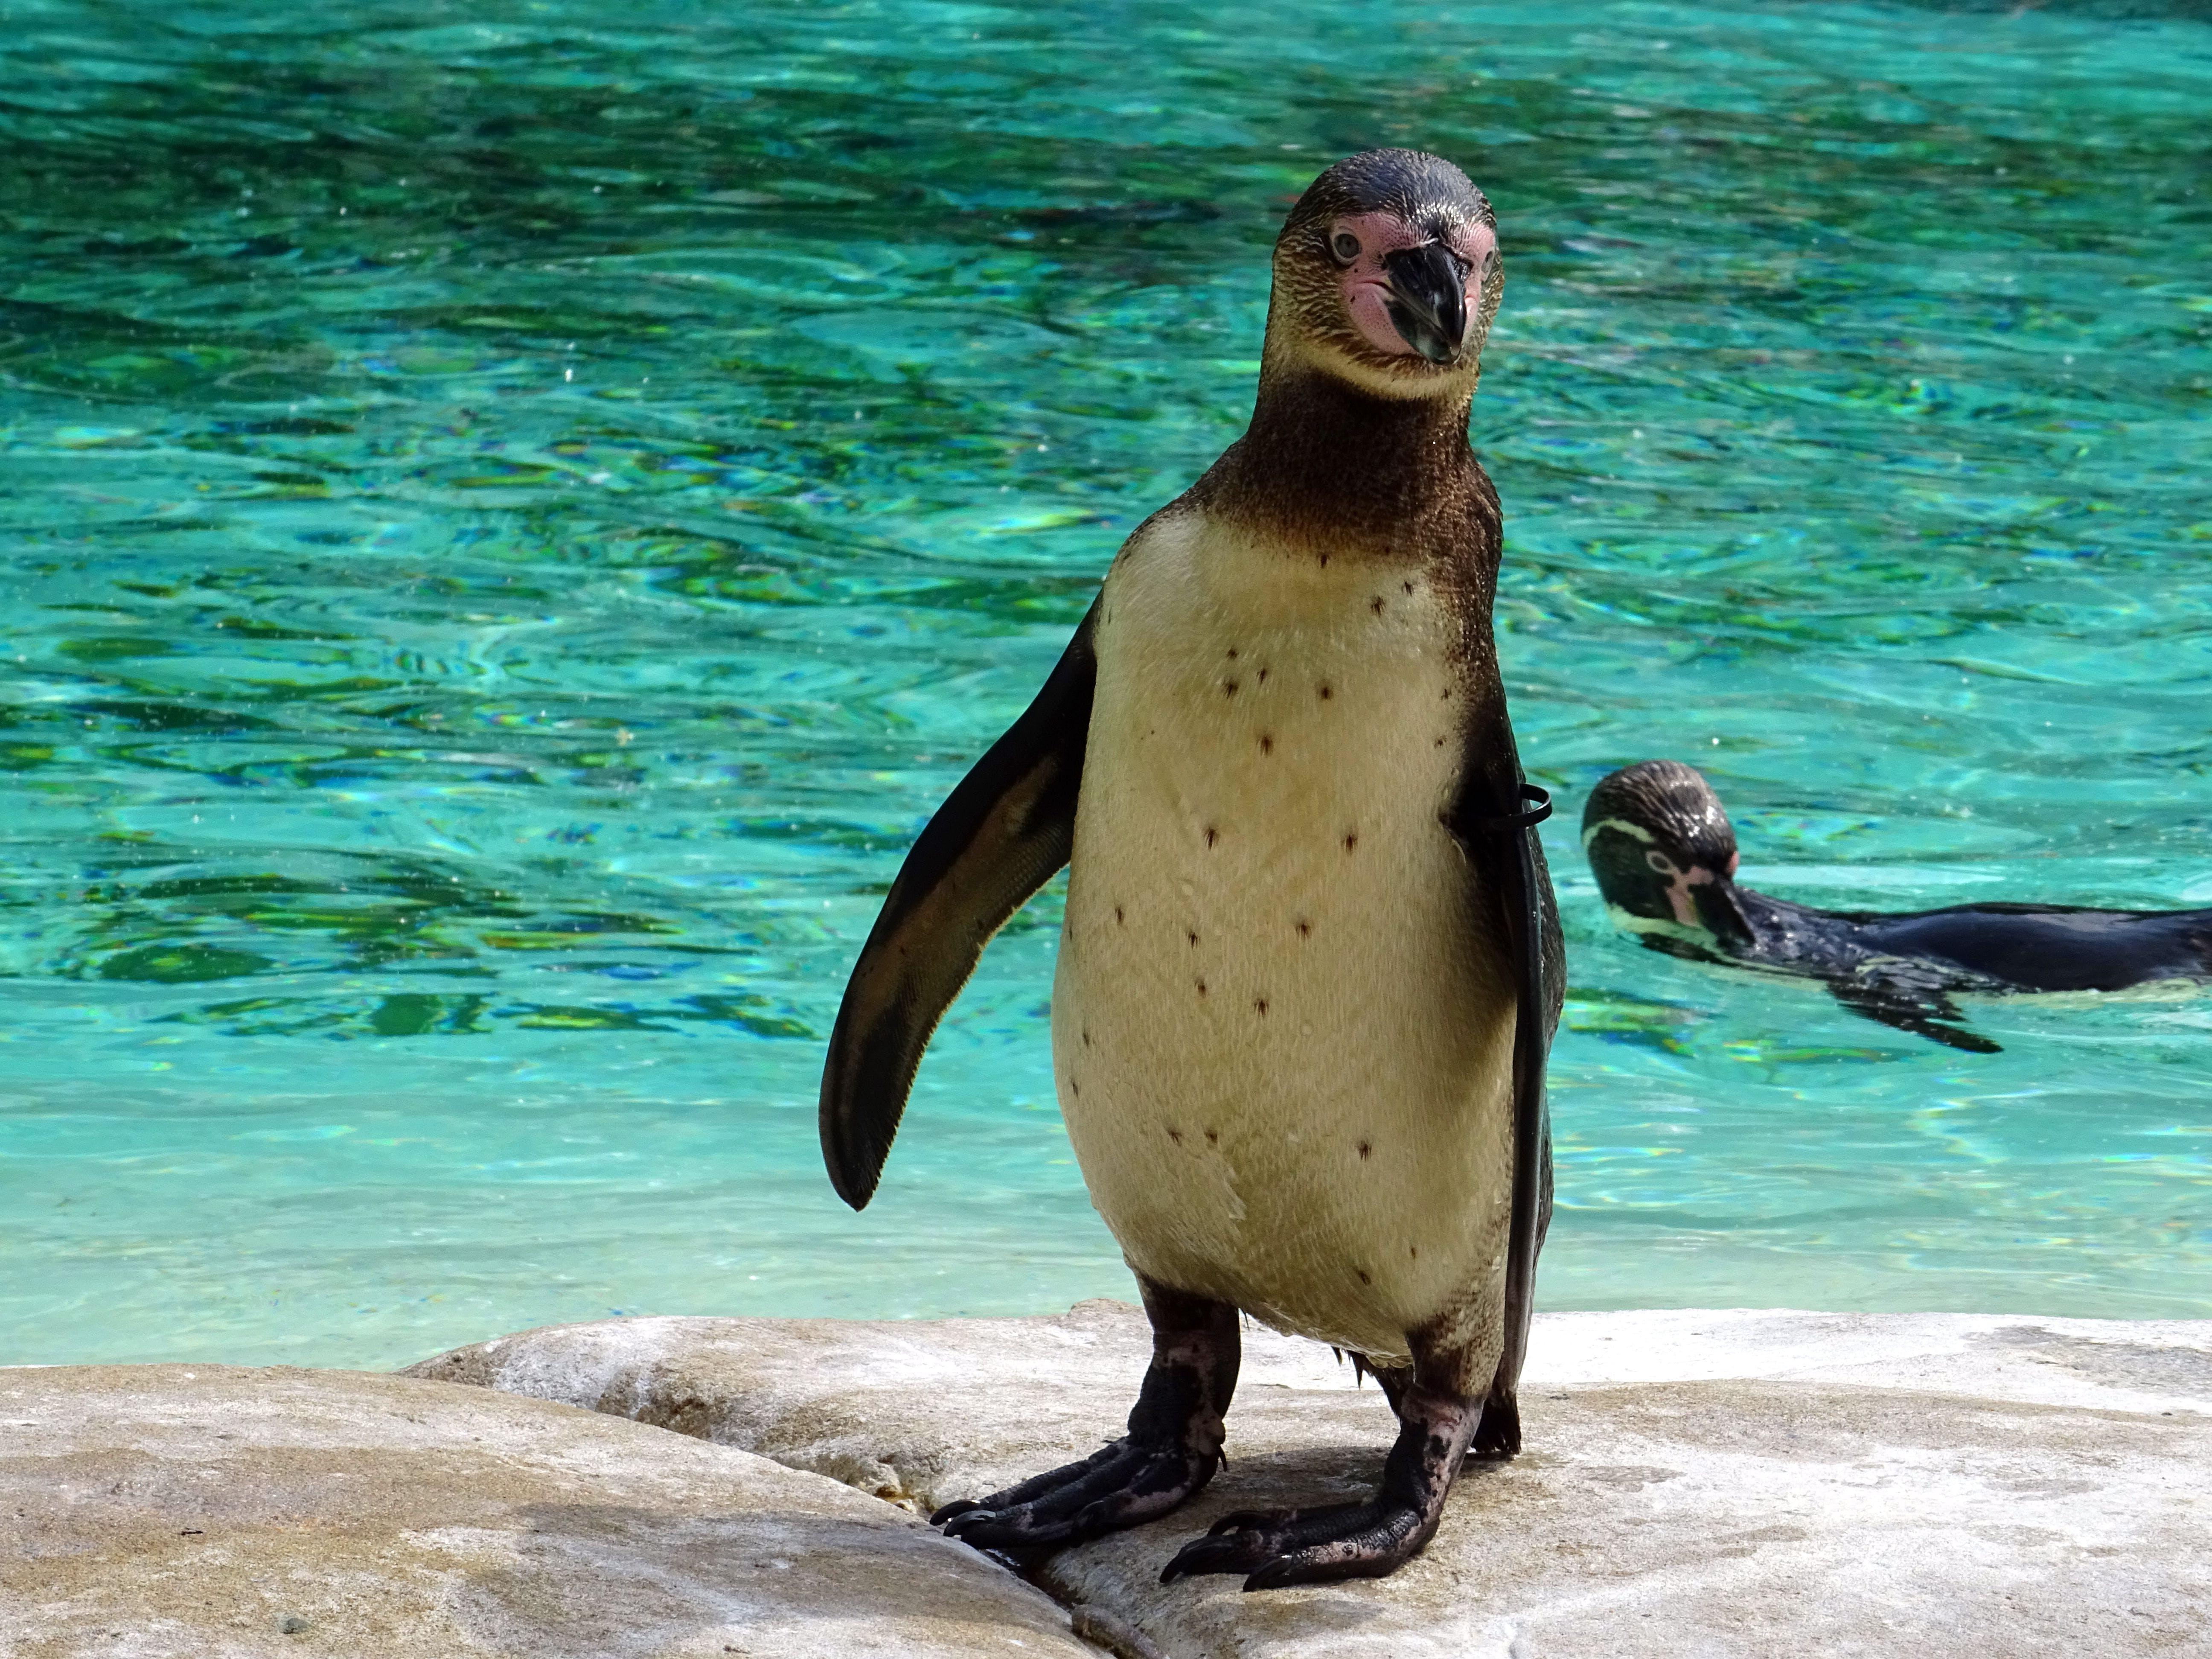 Penguin Standing on Rock Near Body of Water